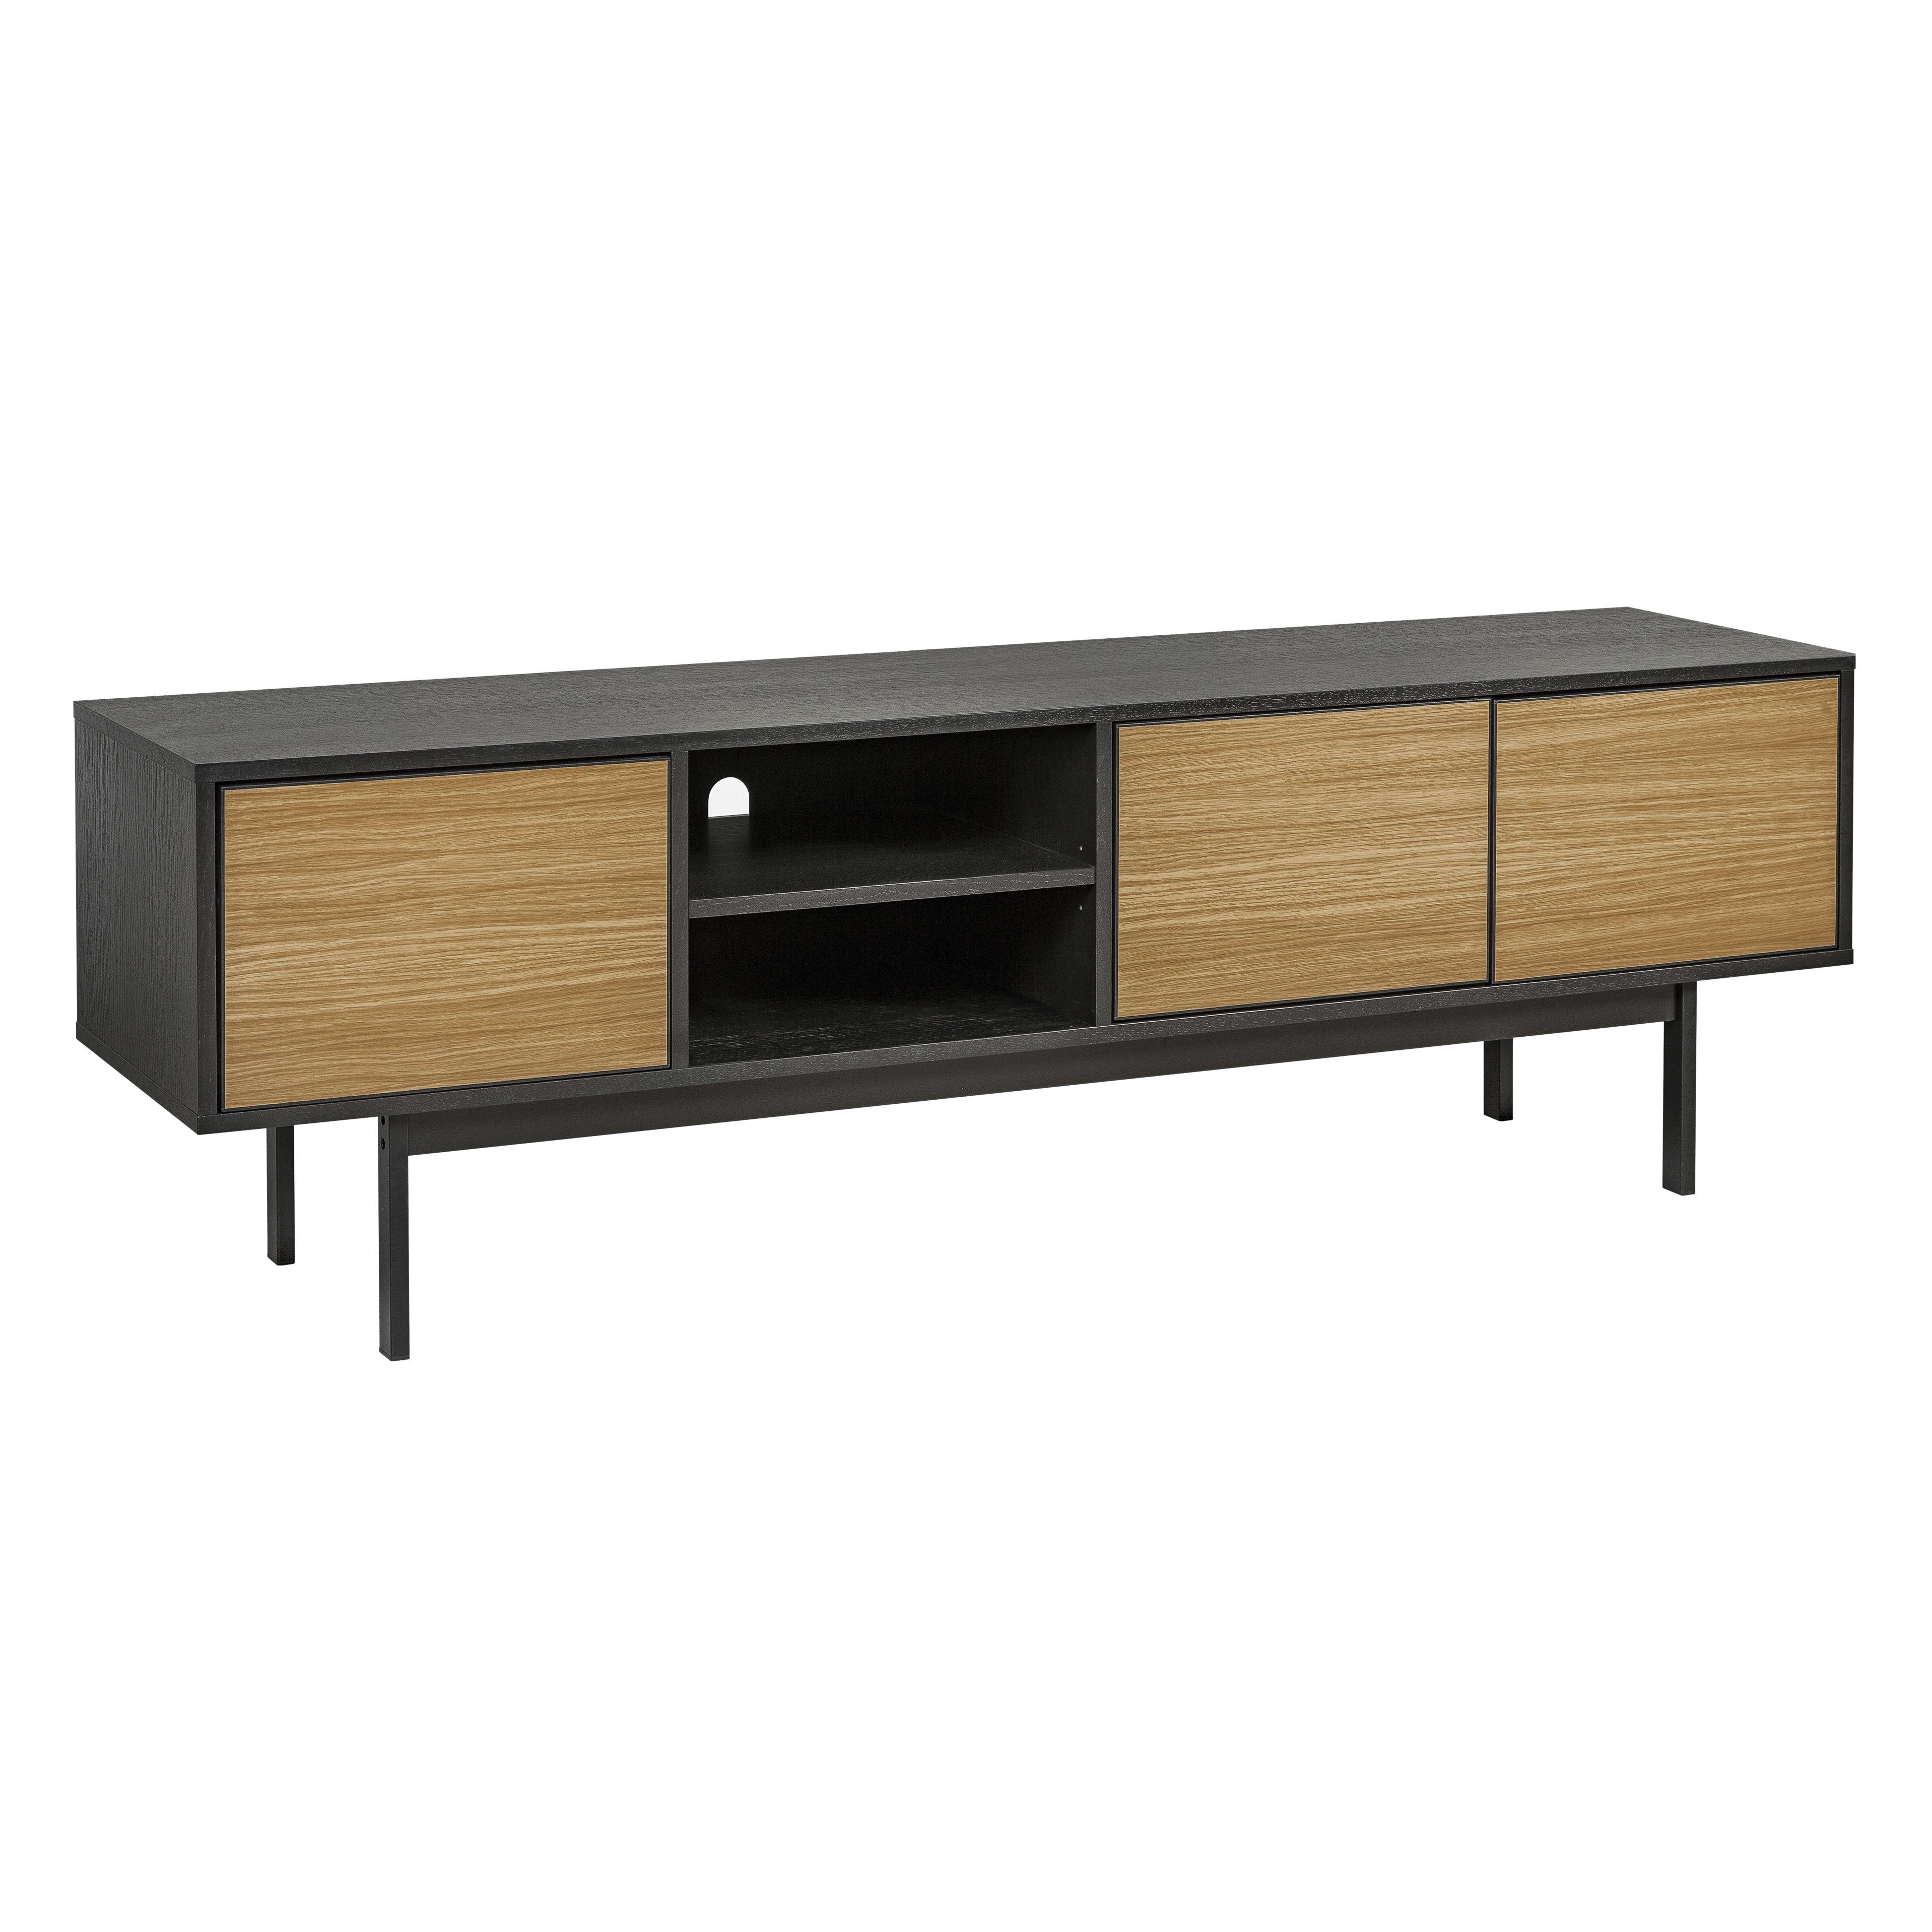 Telaio TV unit oak and black